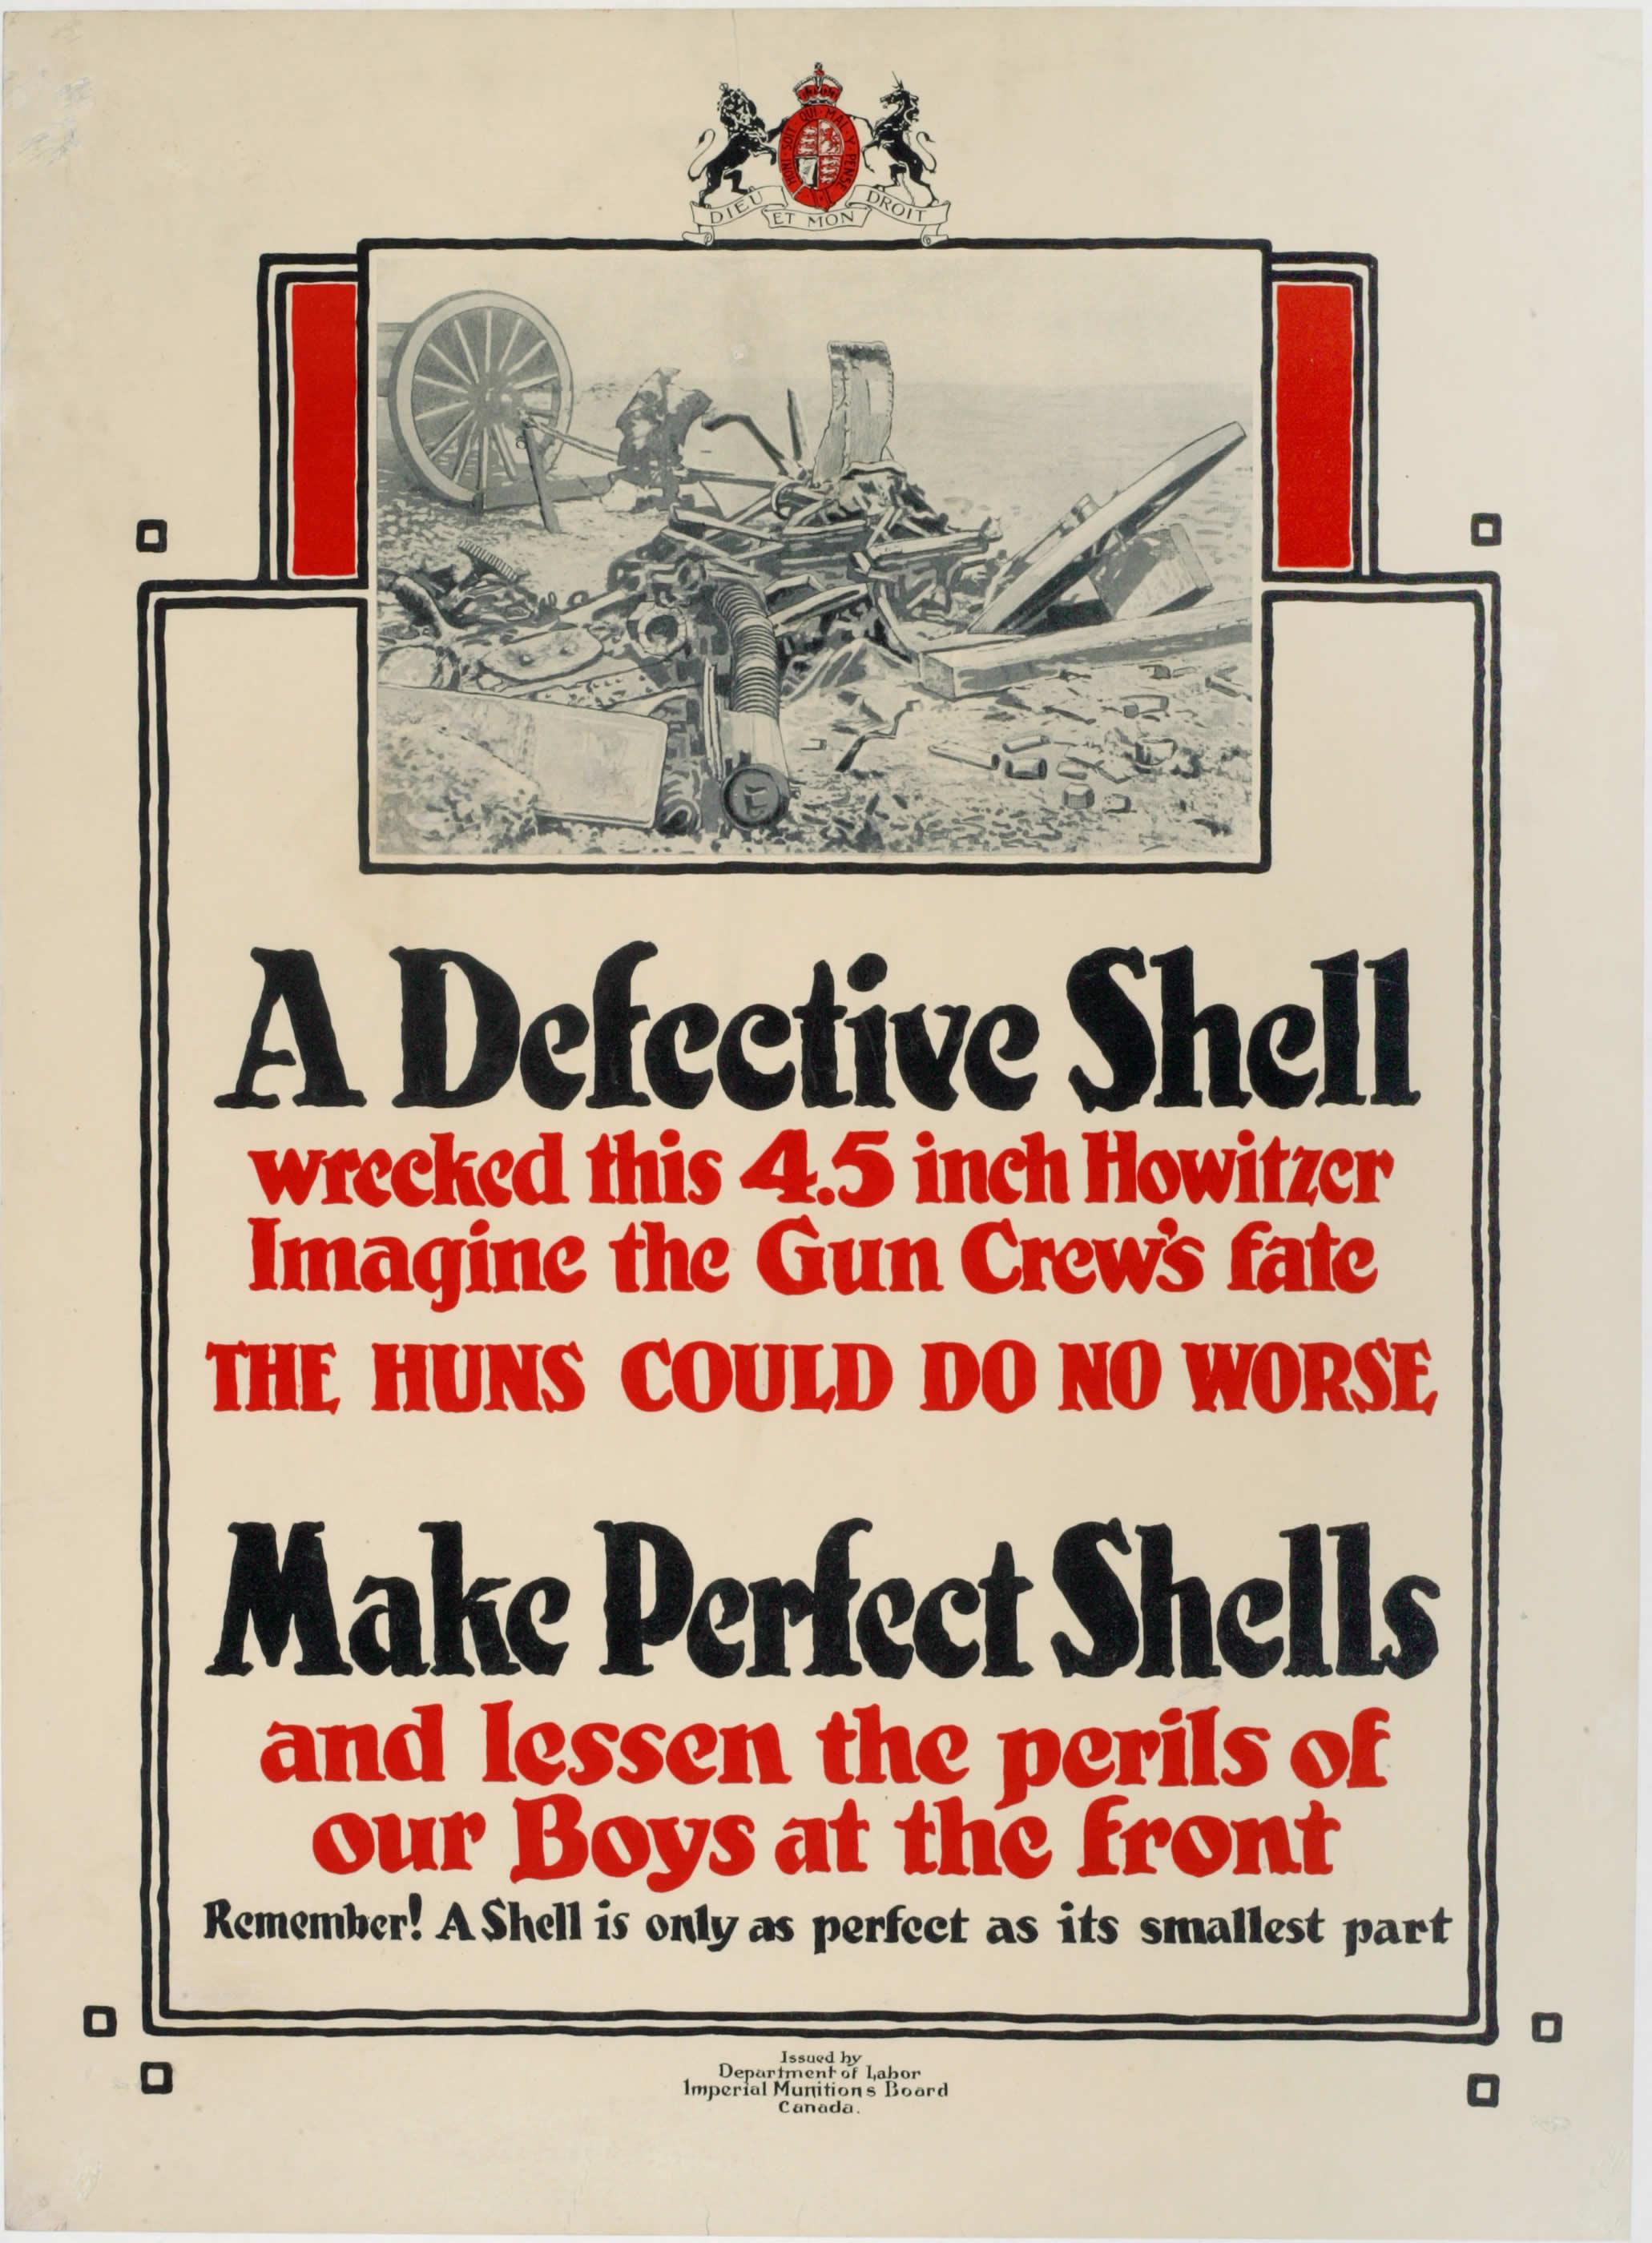 Make Perfect Shells